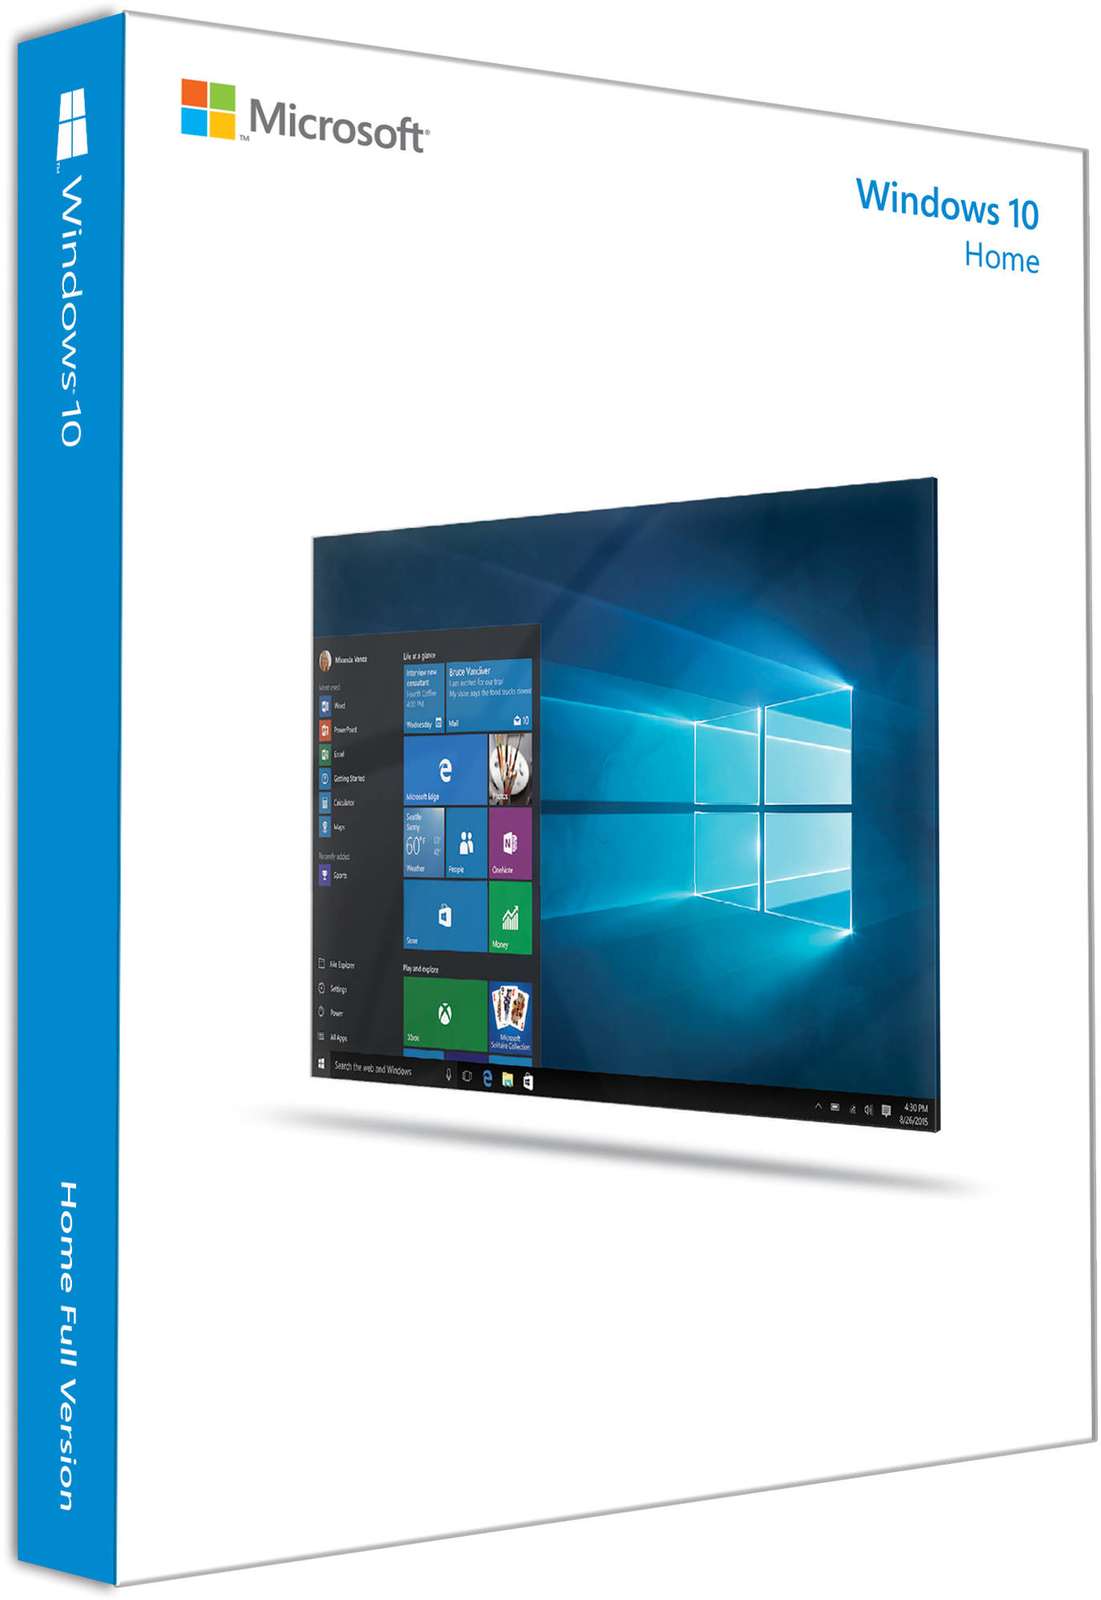 Microsoft Windows 10 Home 64-bit (OEM) image